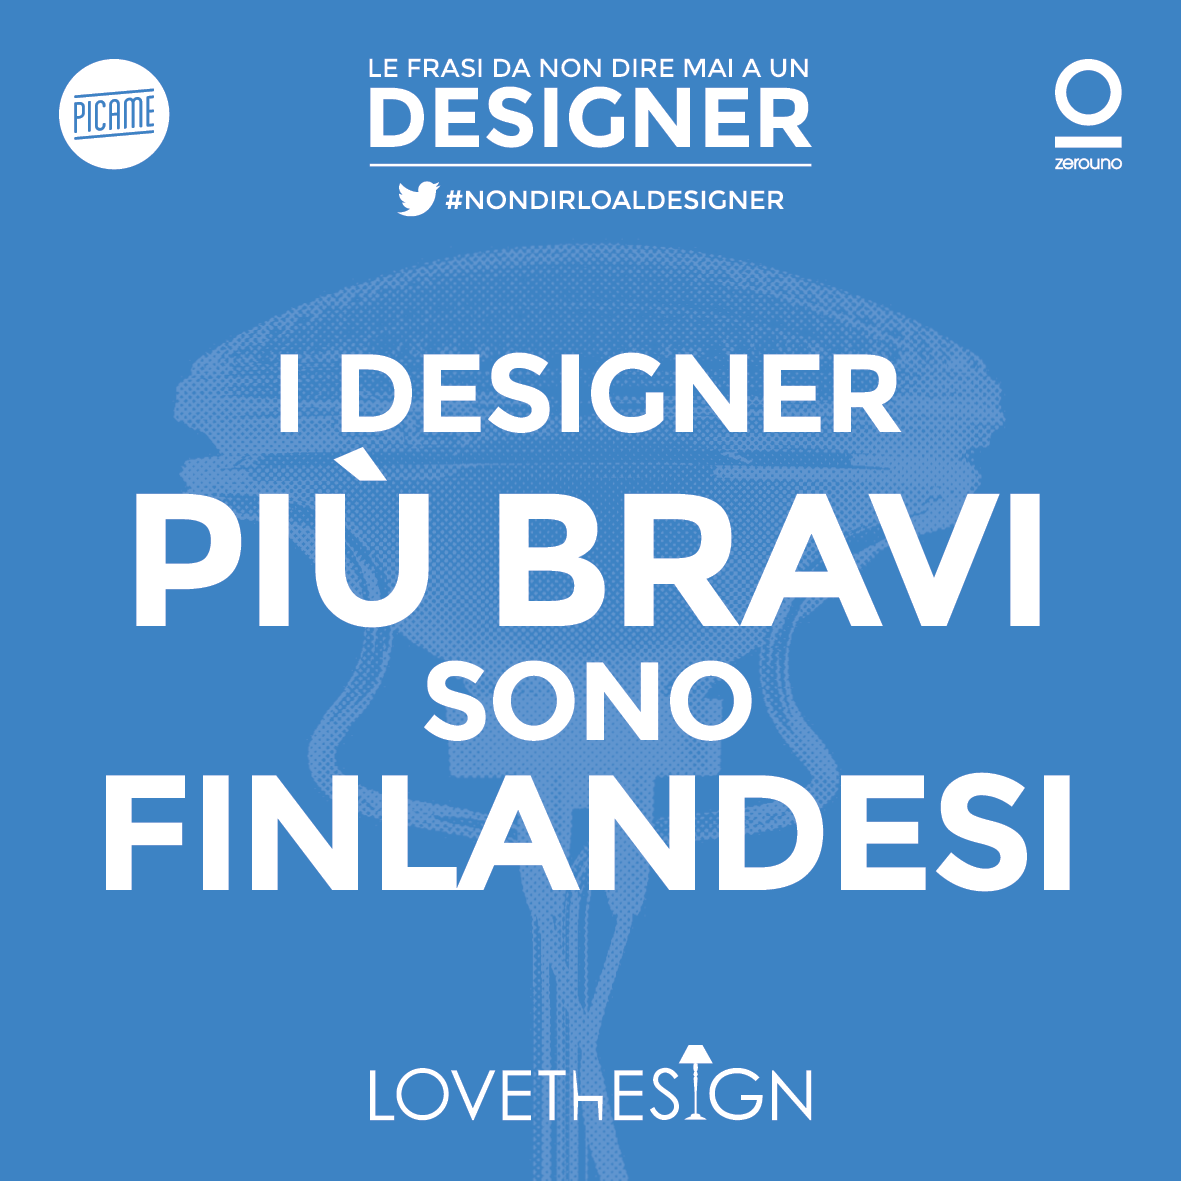 Le frasi da non dire ad un designer zerouno design - Frasi spinte da dire a letto ...